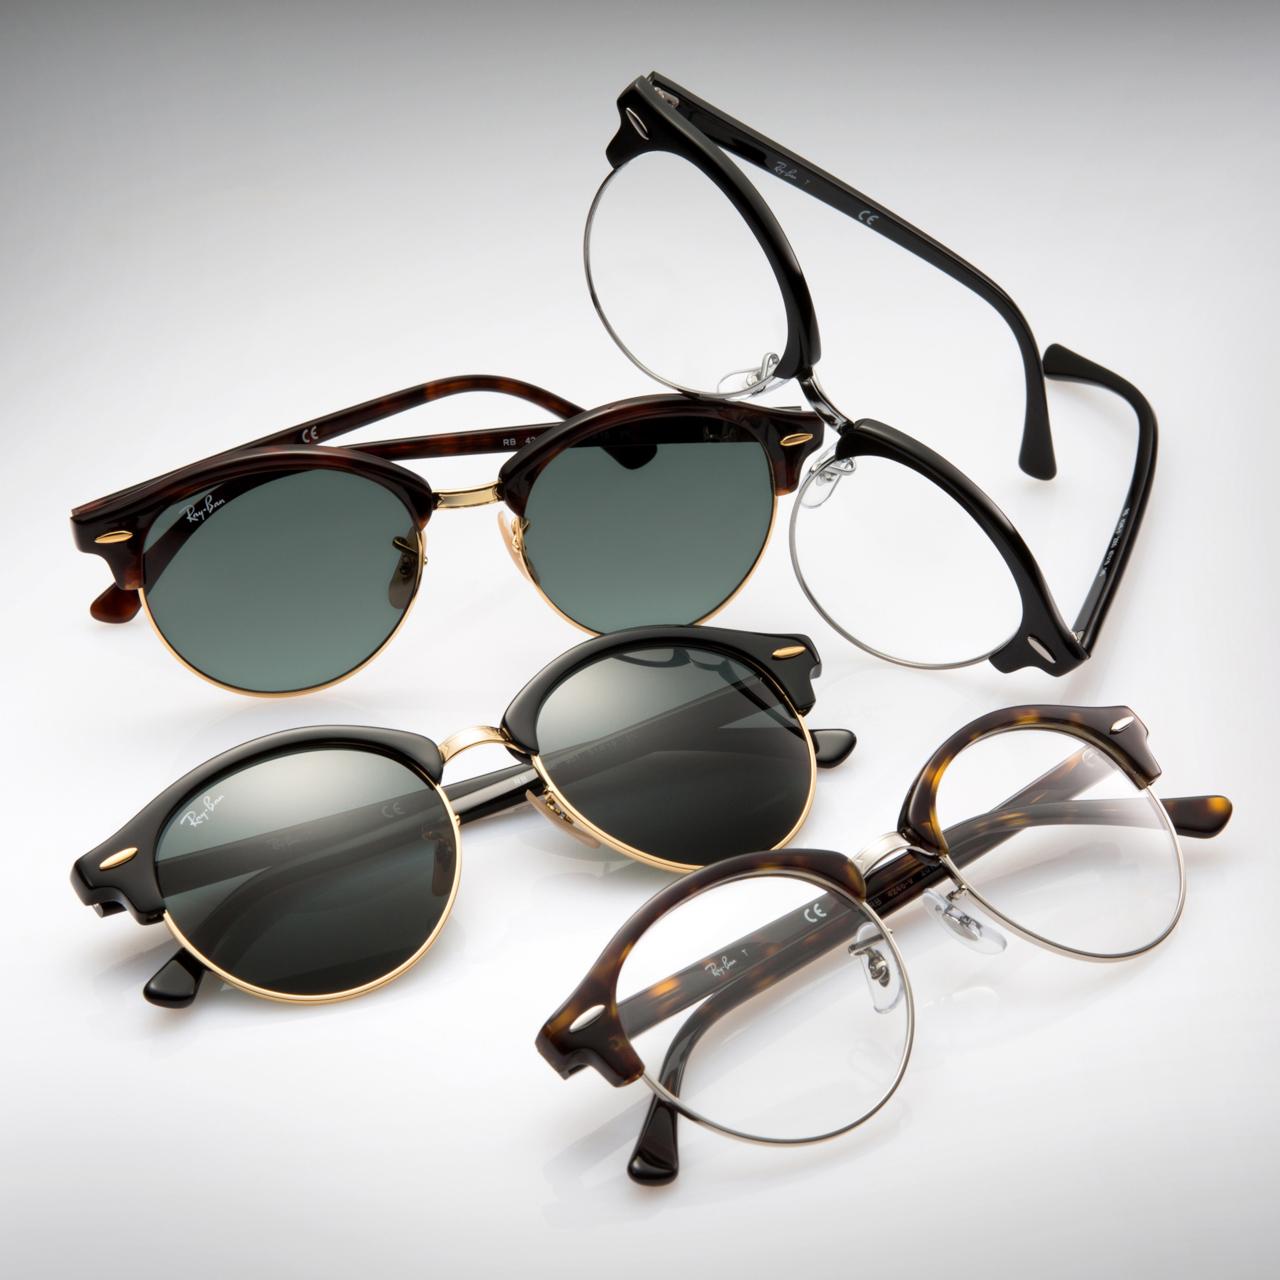 ray ban 2016, naočale ray ban 2016